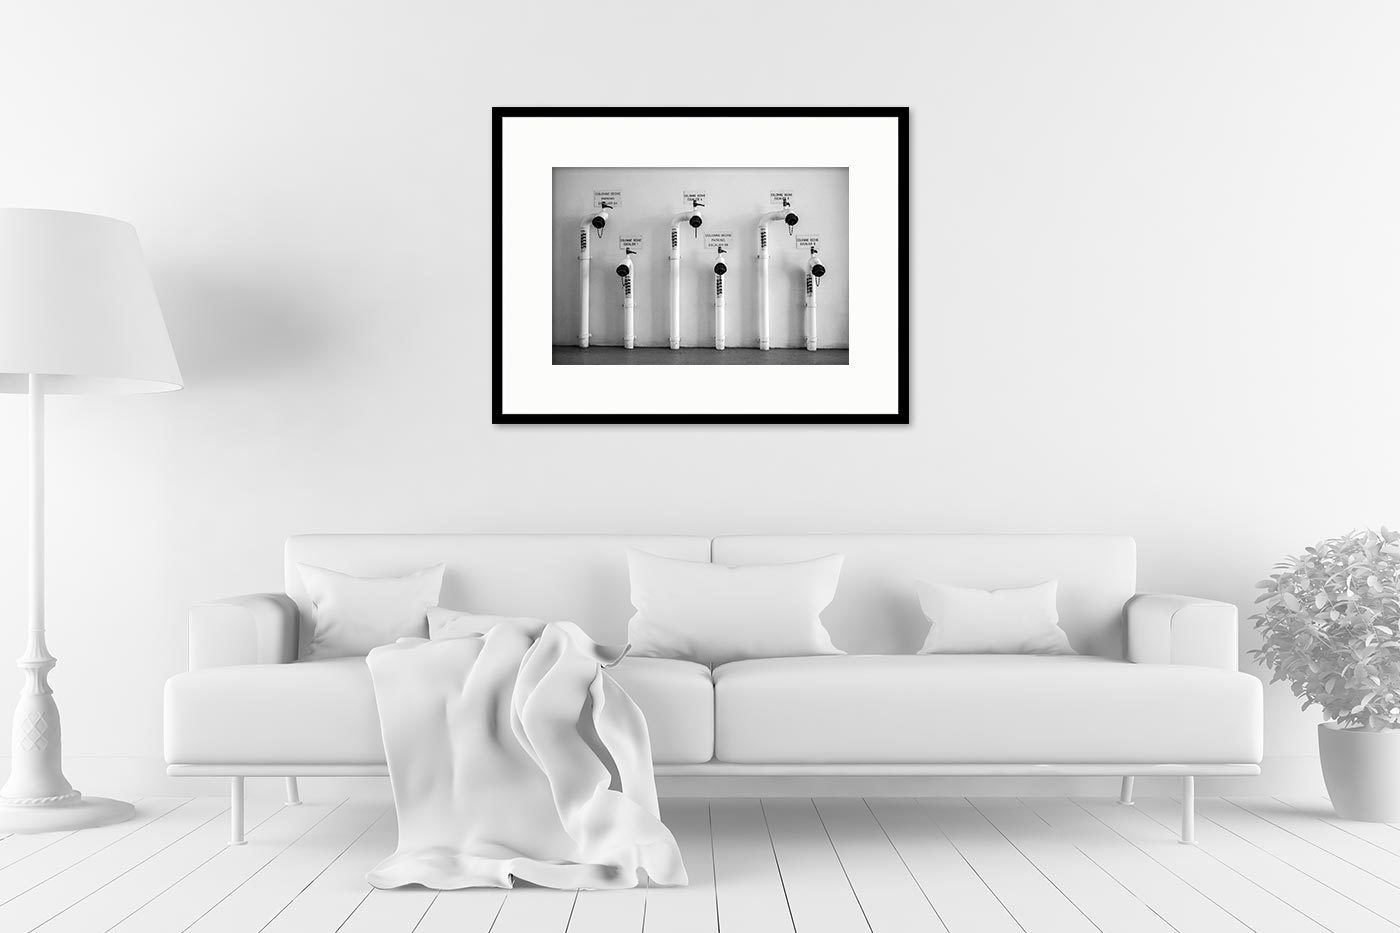 Cadre galerie 60x80 Family Tubes